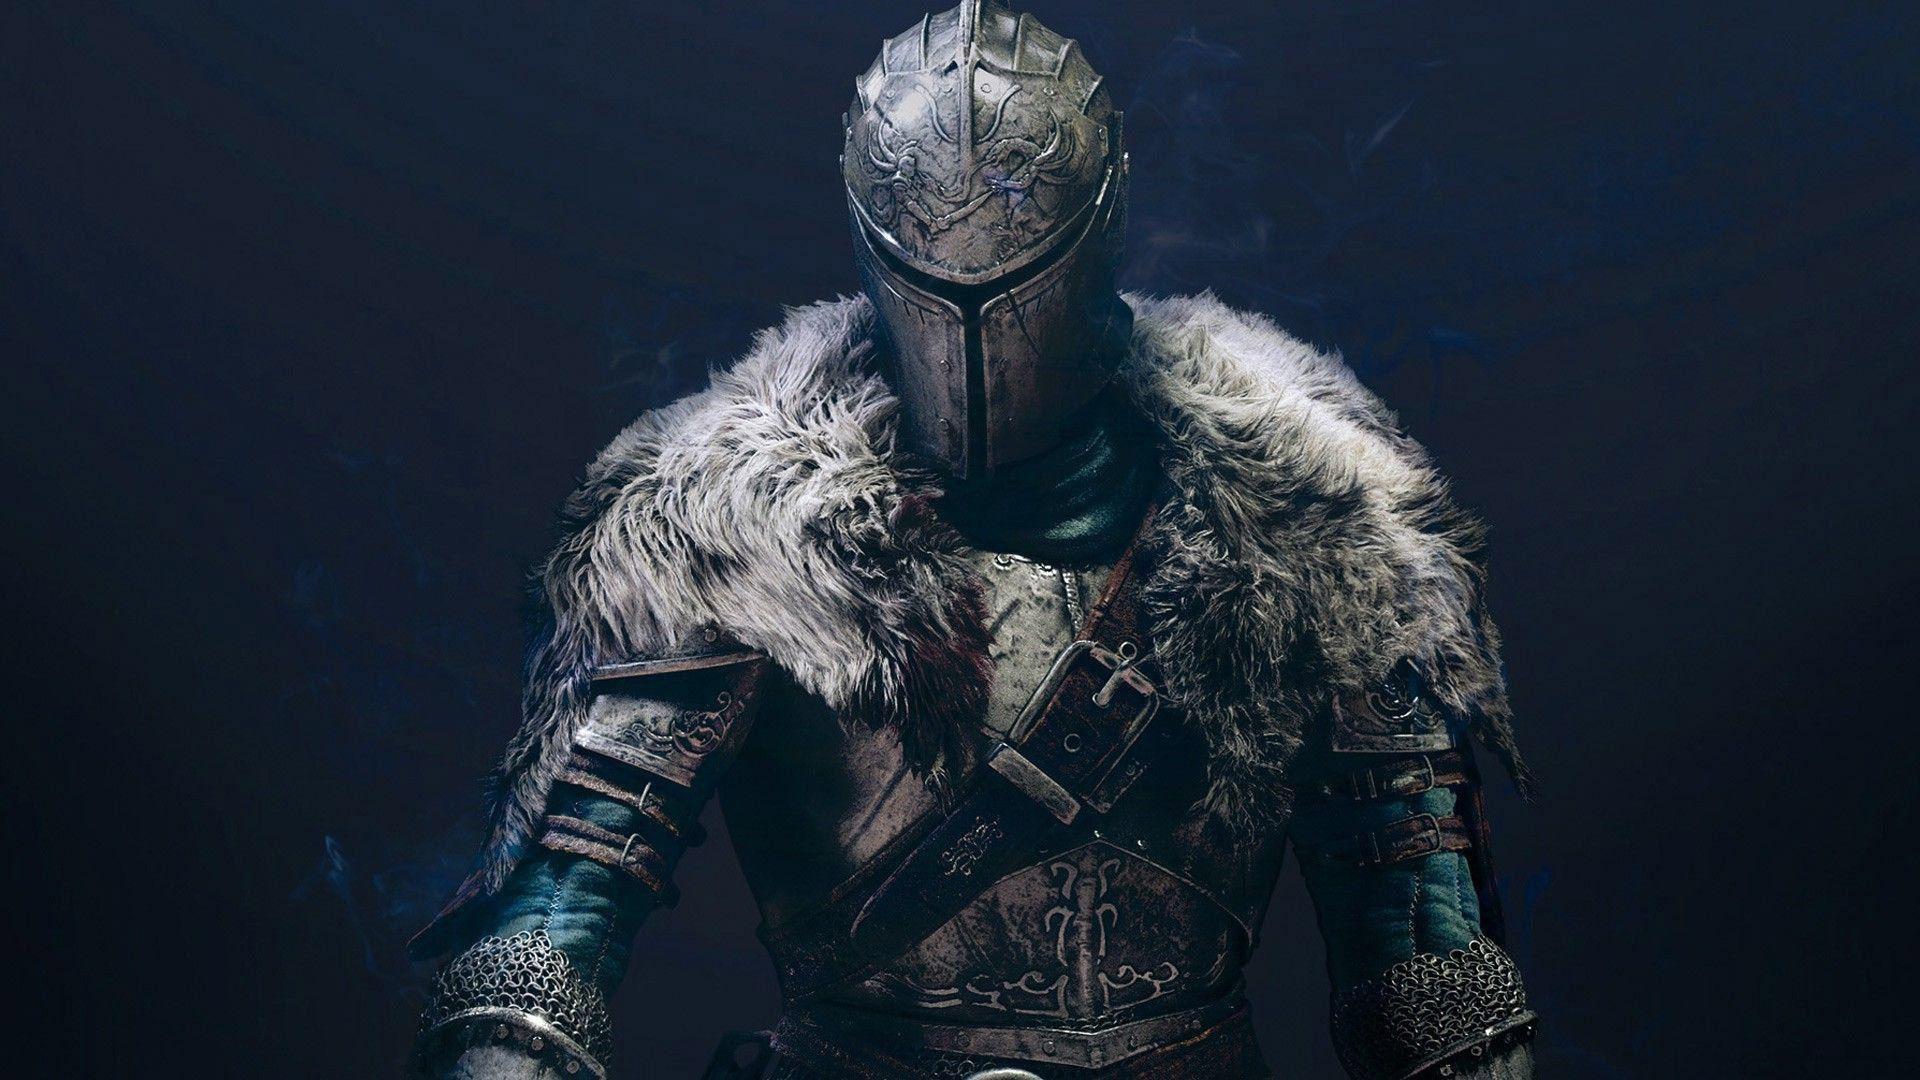 Download Dark Souls II Video Game Launch HD Wallpaper Search more 1920x1080